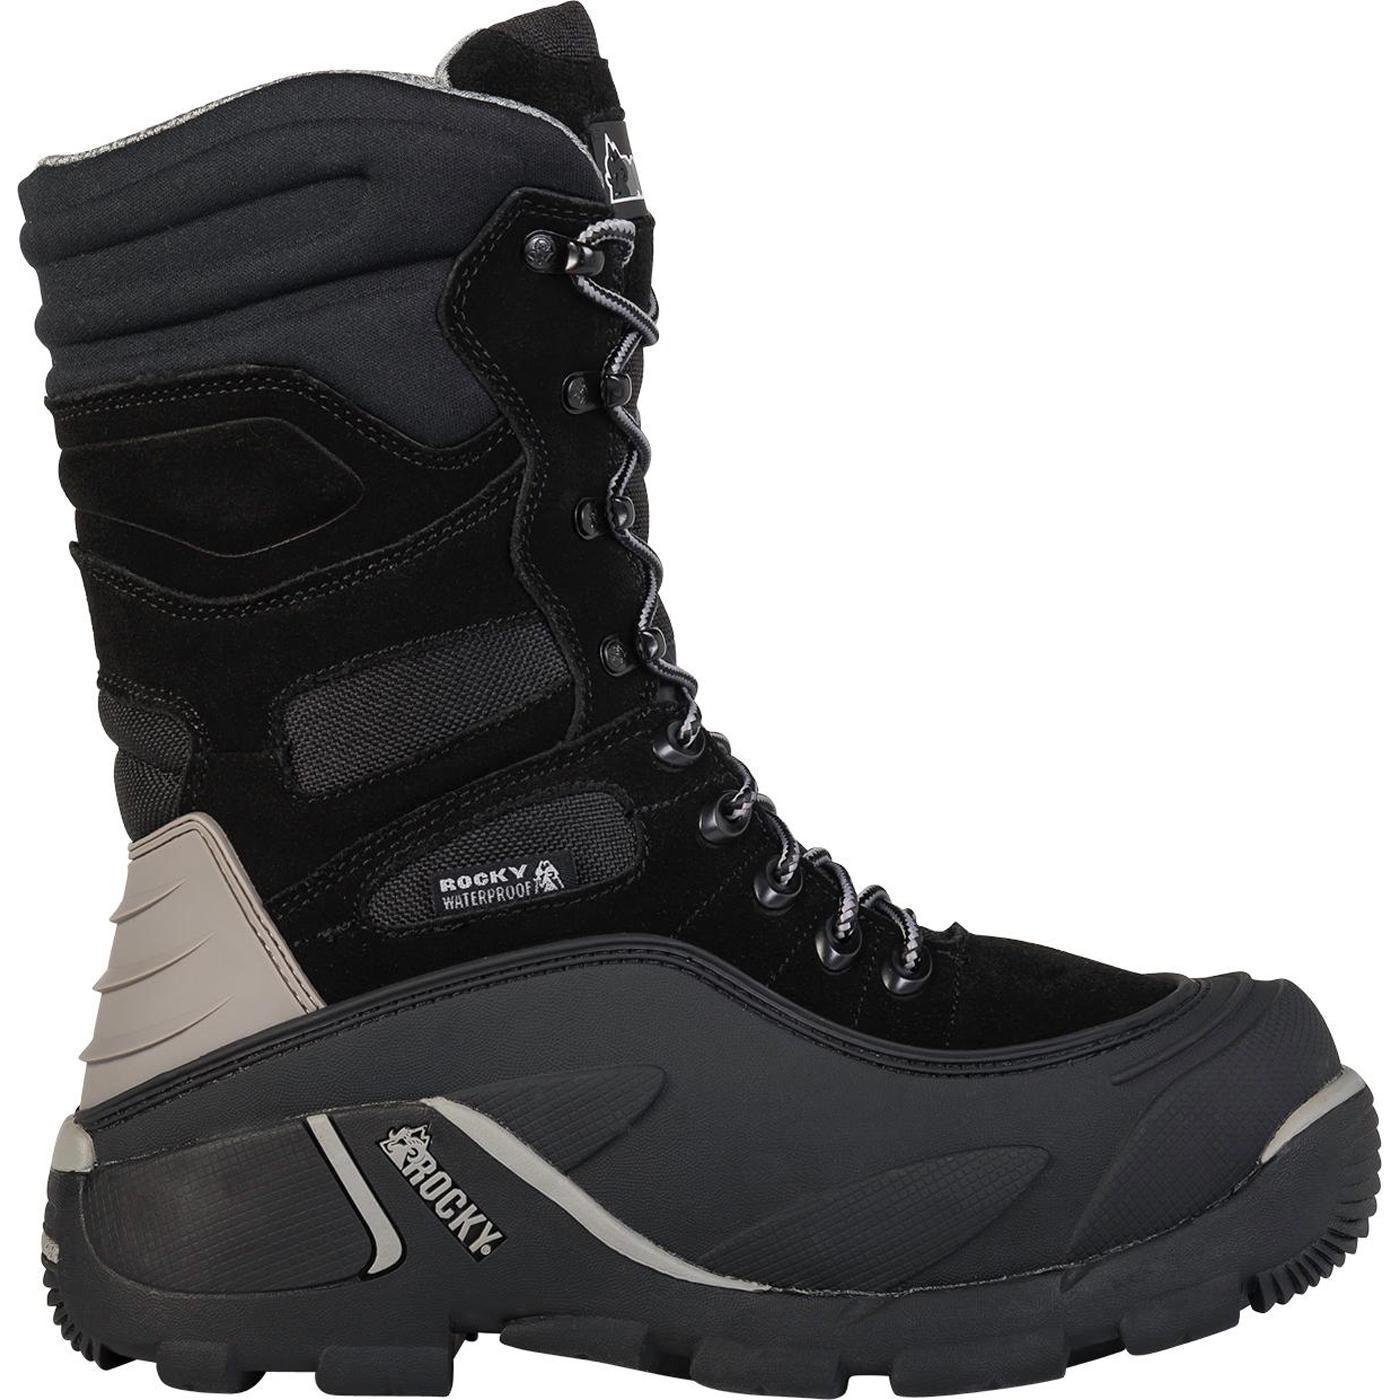 rocky s blizzardstalker waterproof insulated boot